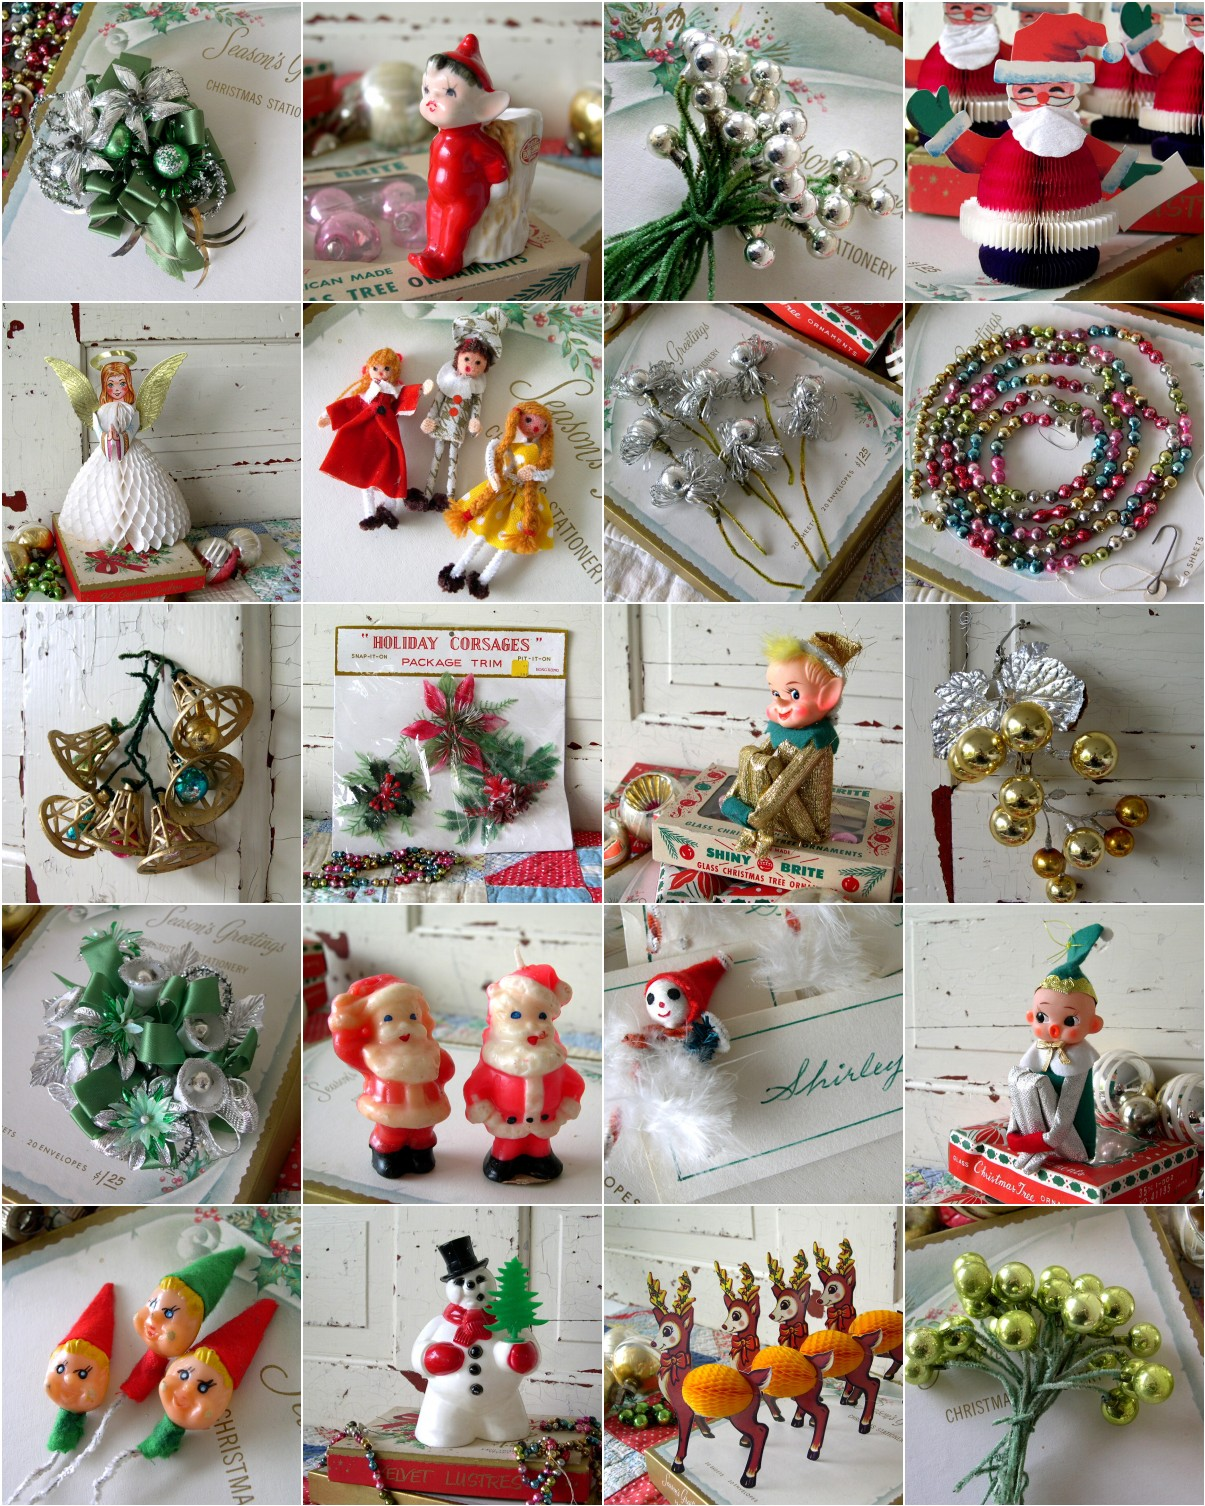 Retro Christmas Decorations Ideas: Into Vintage: A Blue Christmas